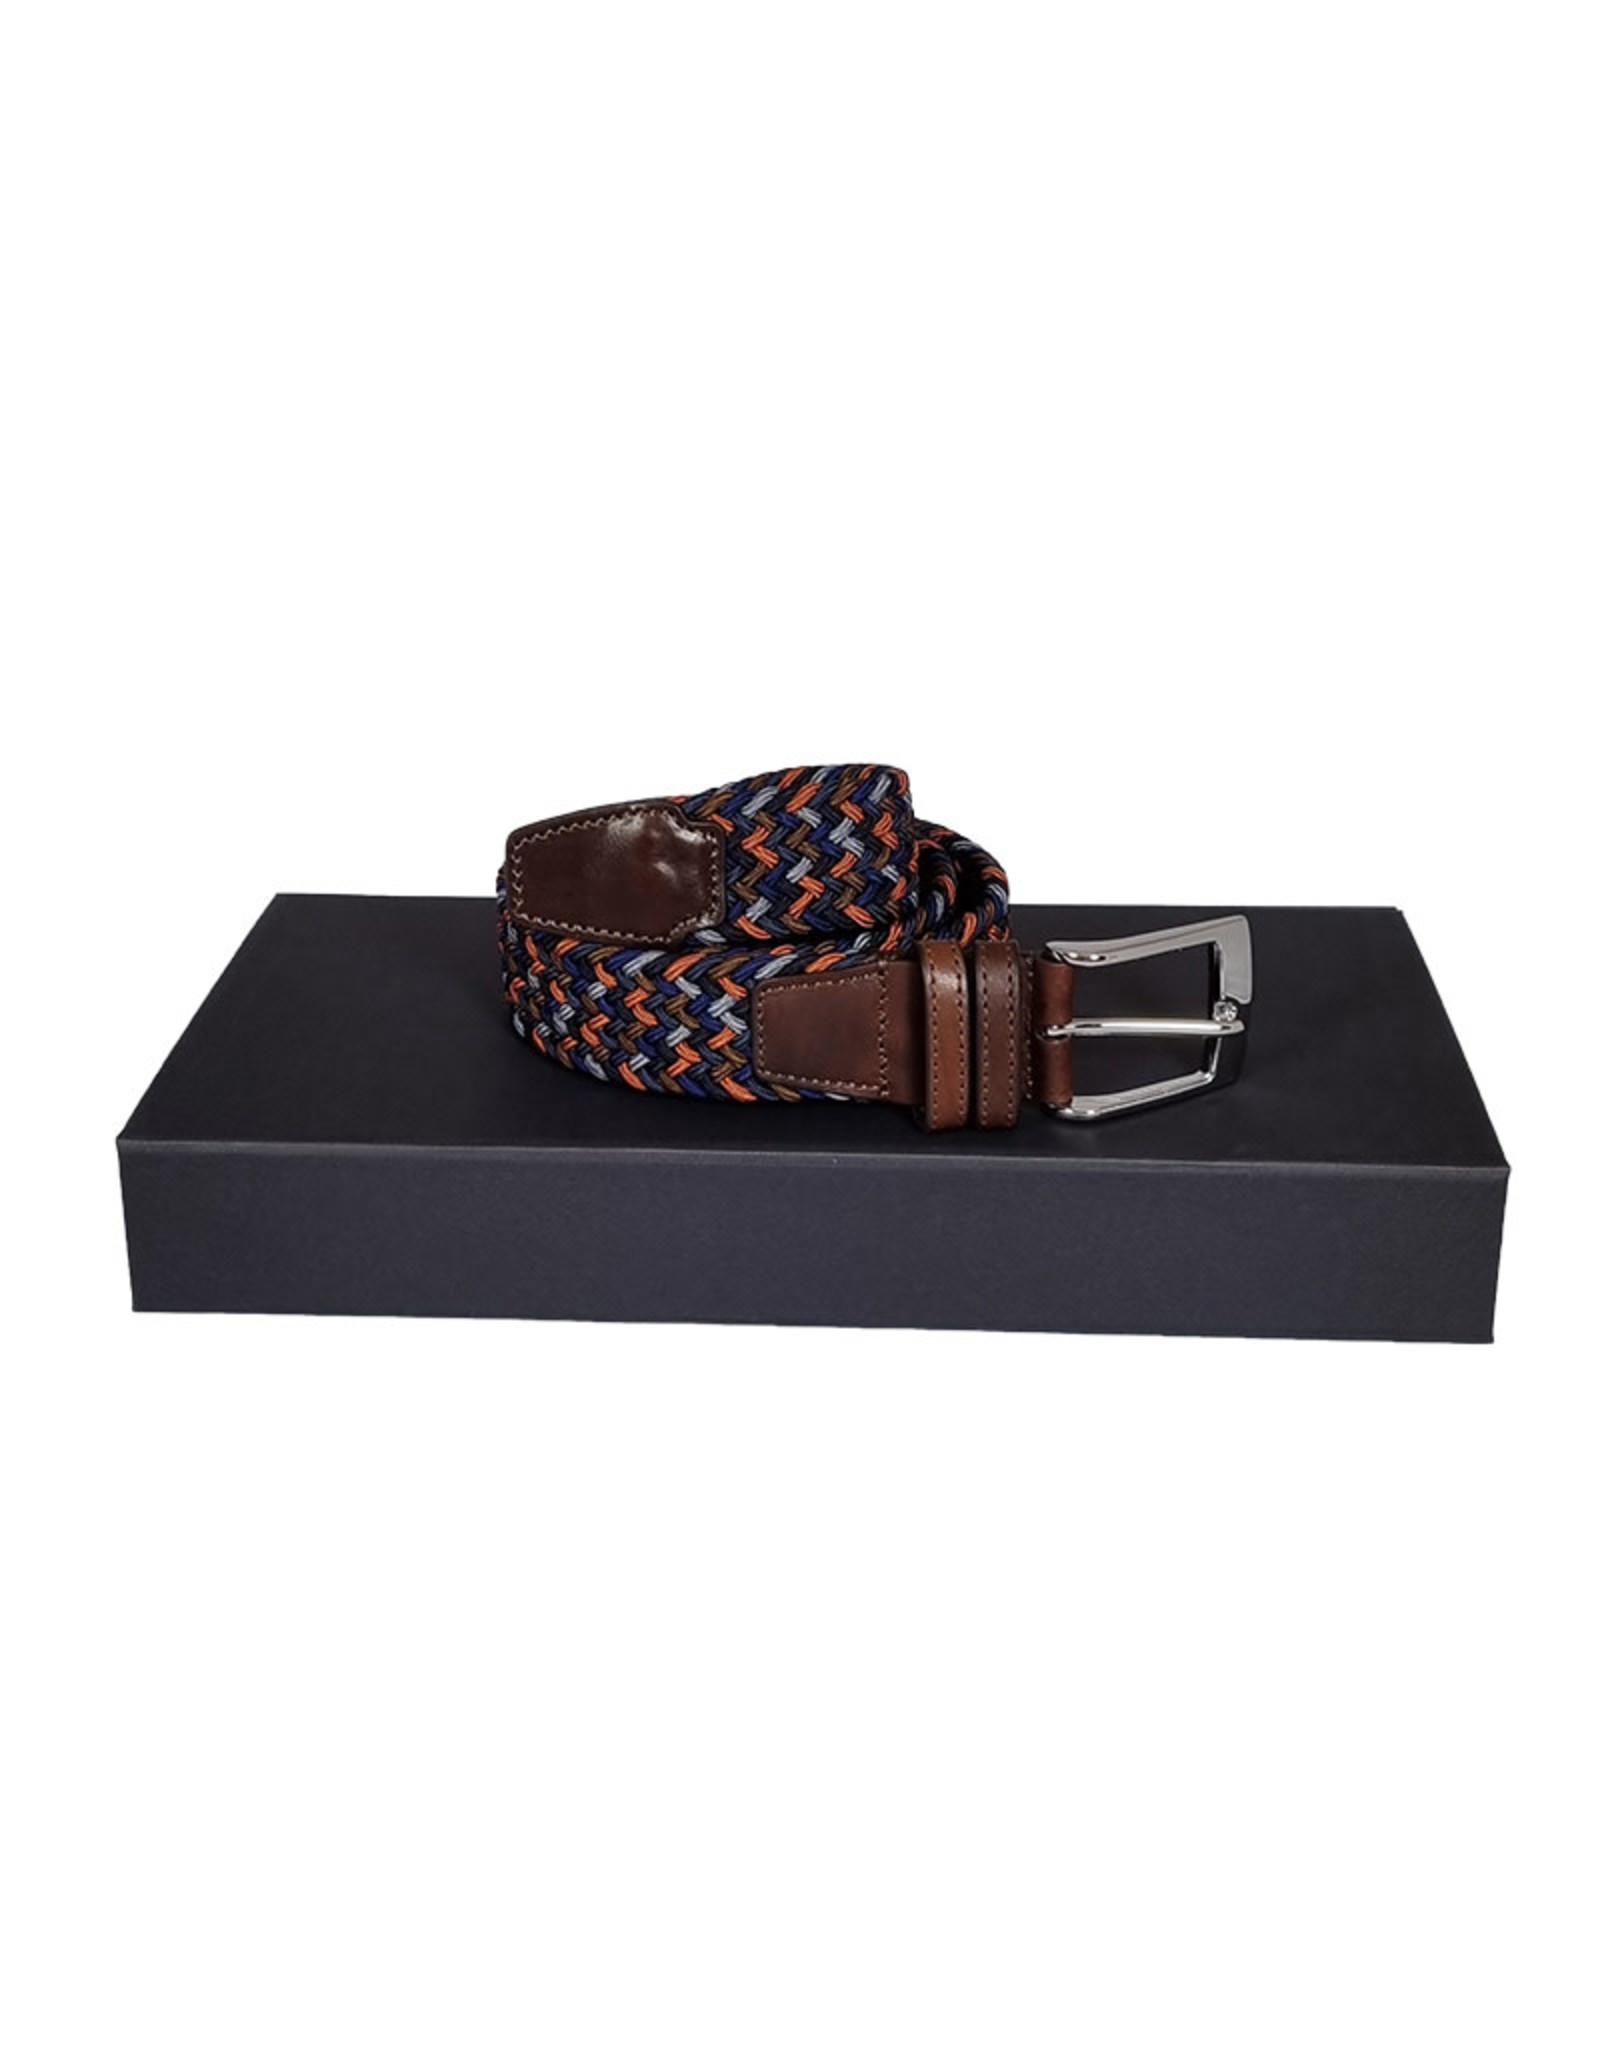 Belts+ Belts+ riem elastisch blauw-bruin-oranje Aimar 19628/001